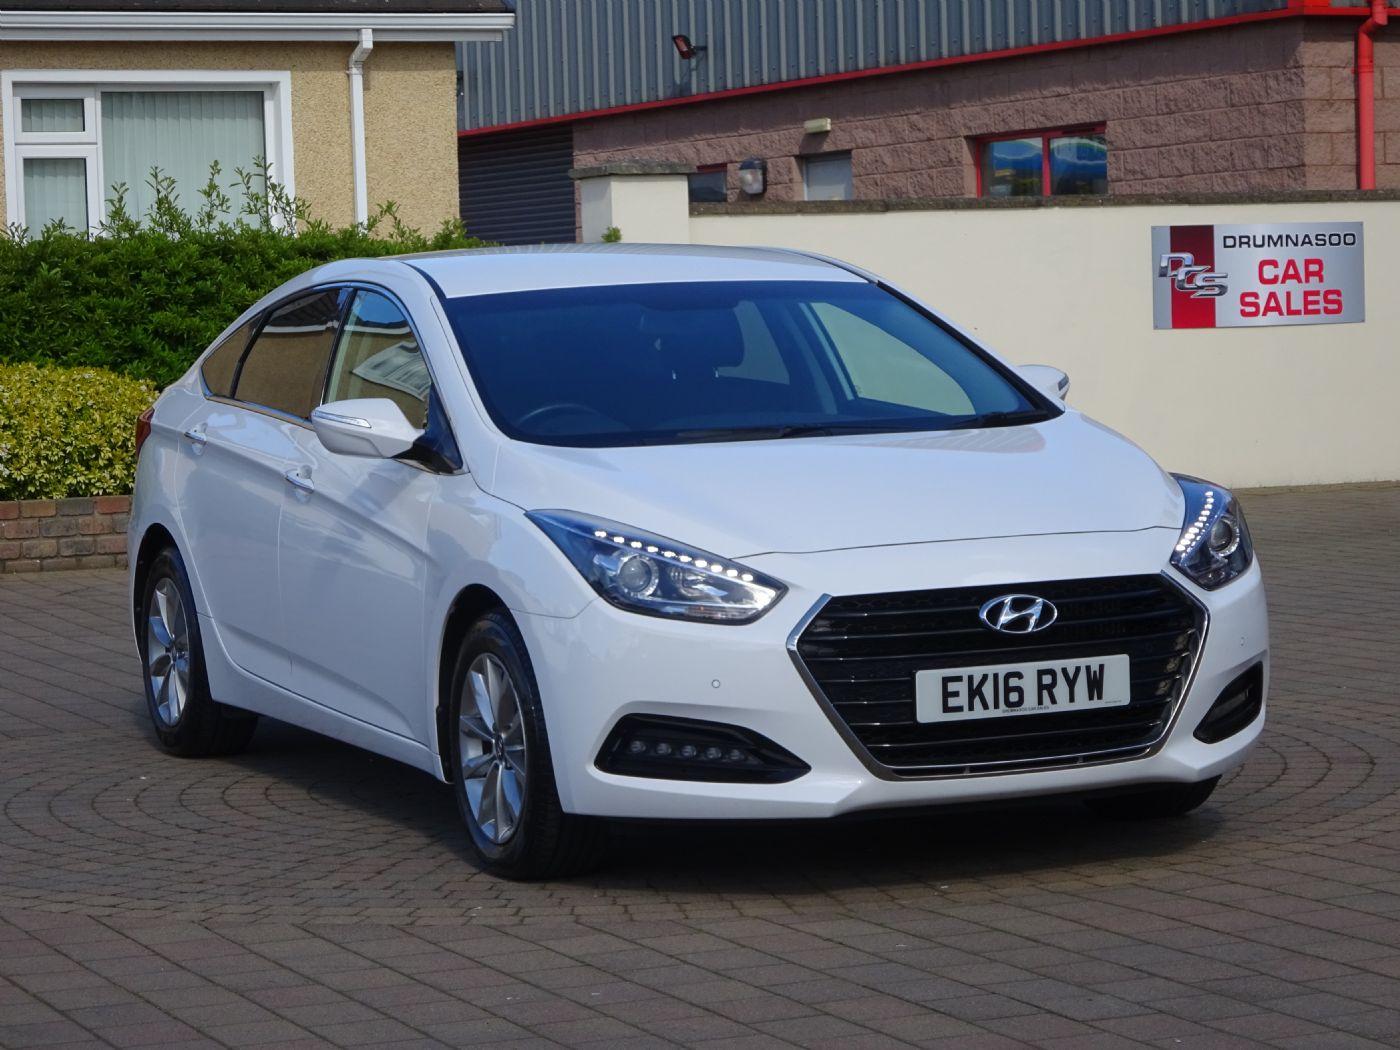 Hyundai I40 SE NAV 1.7 CRDI Blue Drive, £20 Road tax, Sat nav